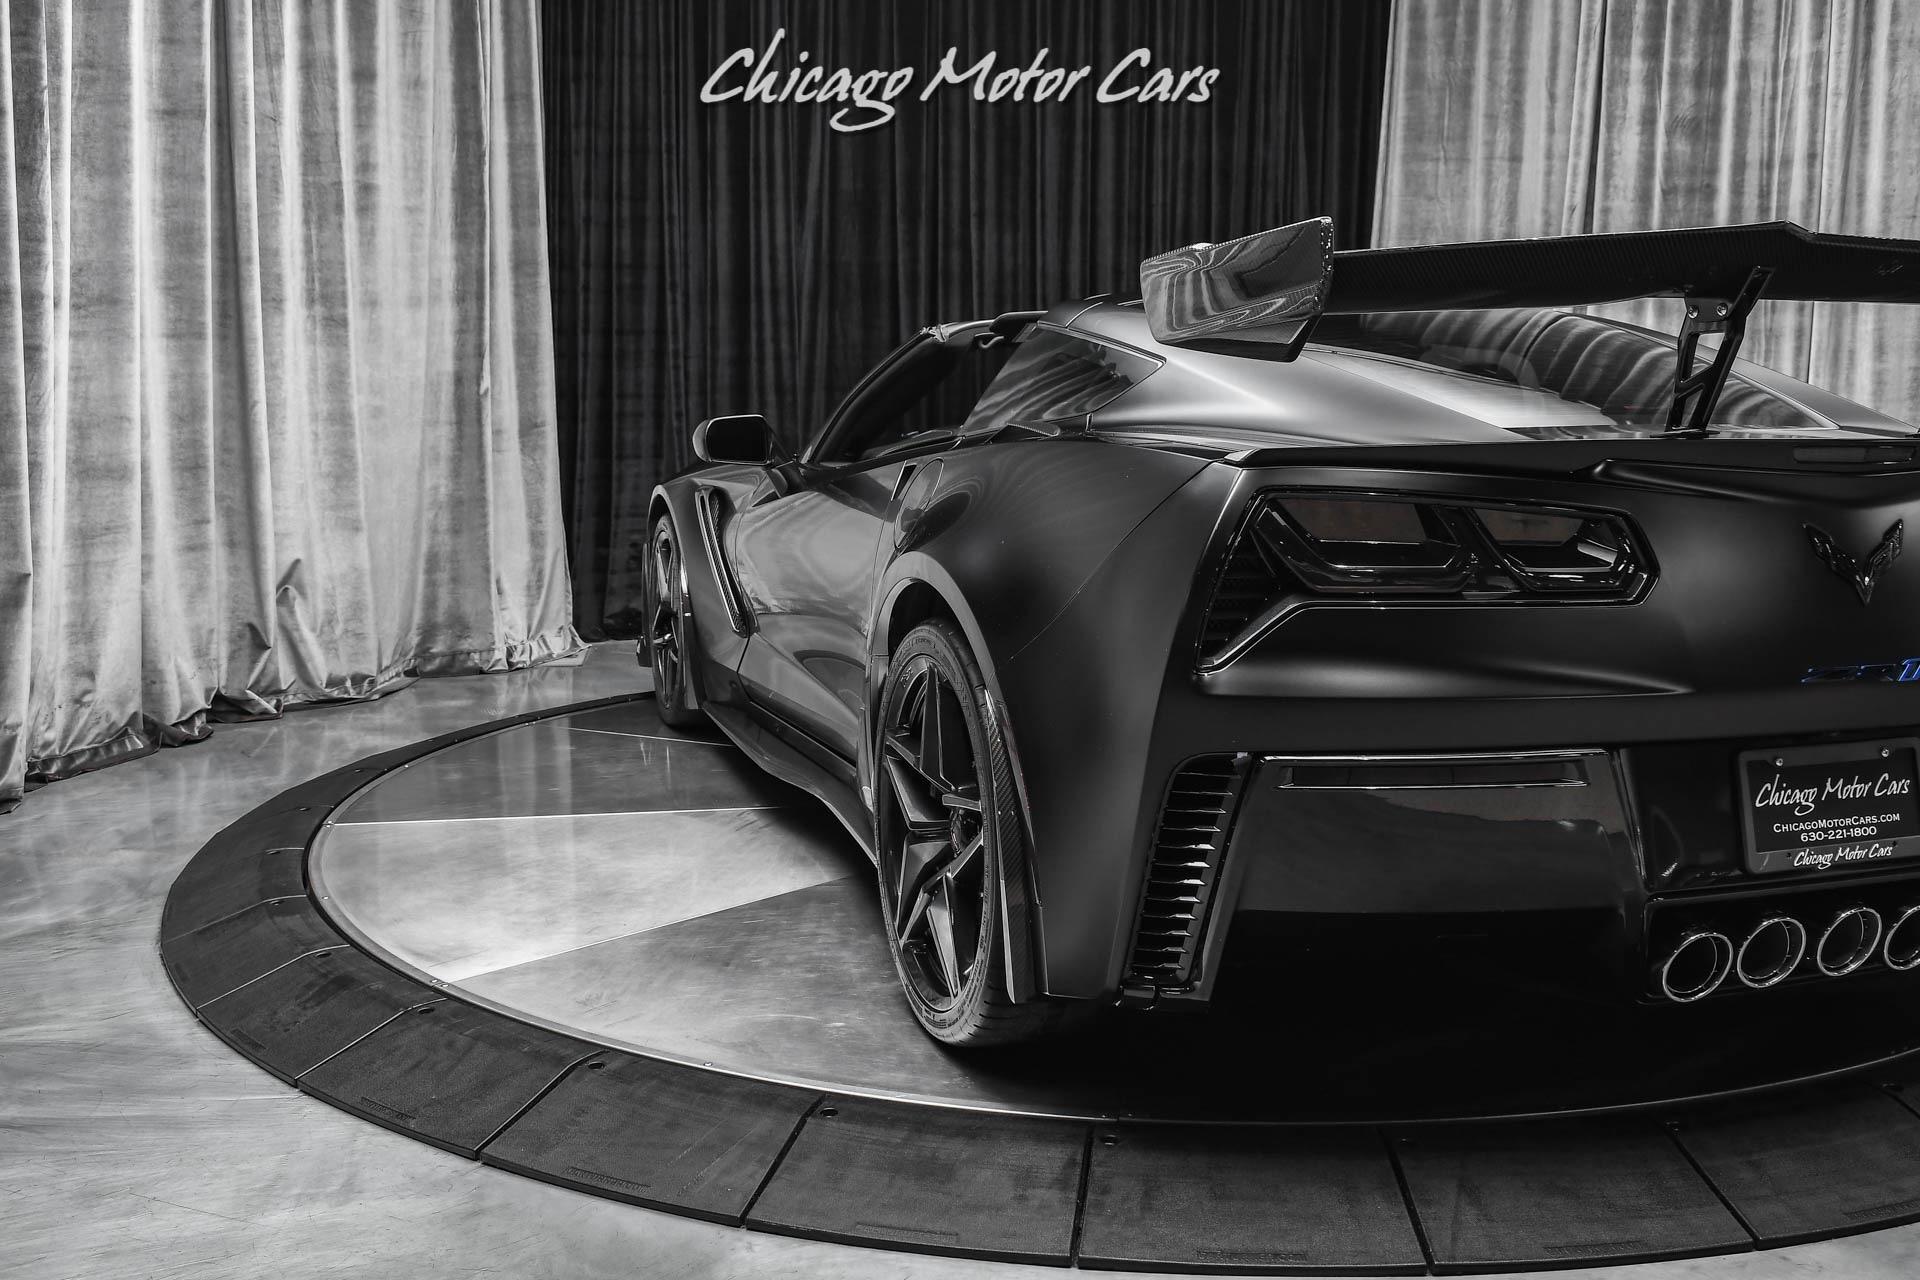 Used-2019-Chevrolet-Corvette-ZR1-MANUAL-TRANSMISSION-LOW-MILES-SATIN-PPF